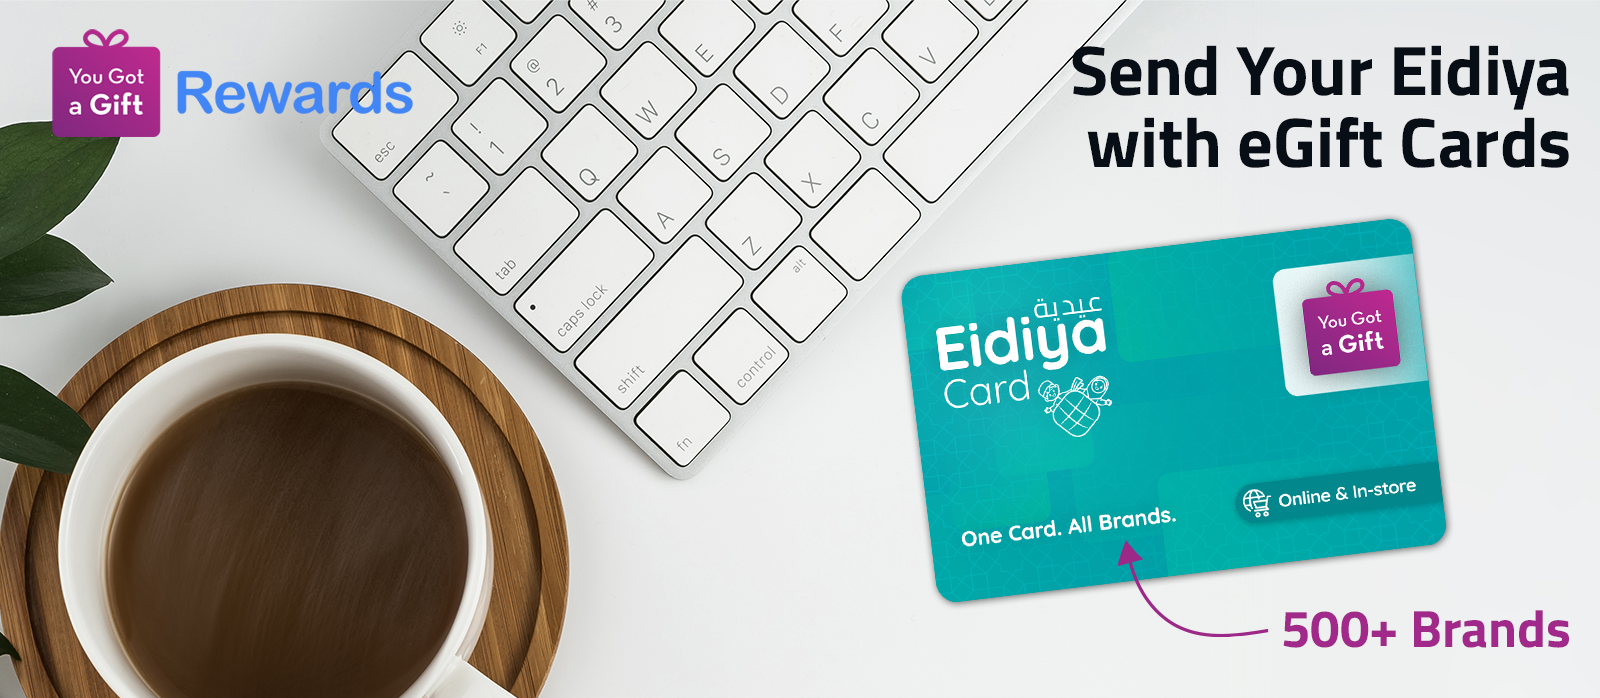 Have you Gone Digital with your Eidiya yet?